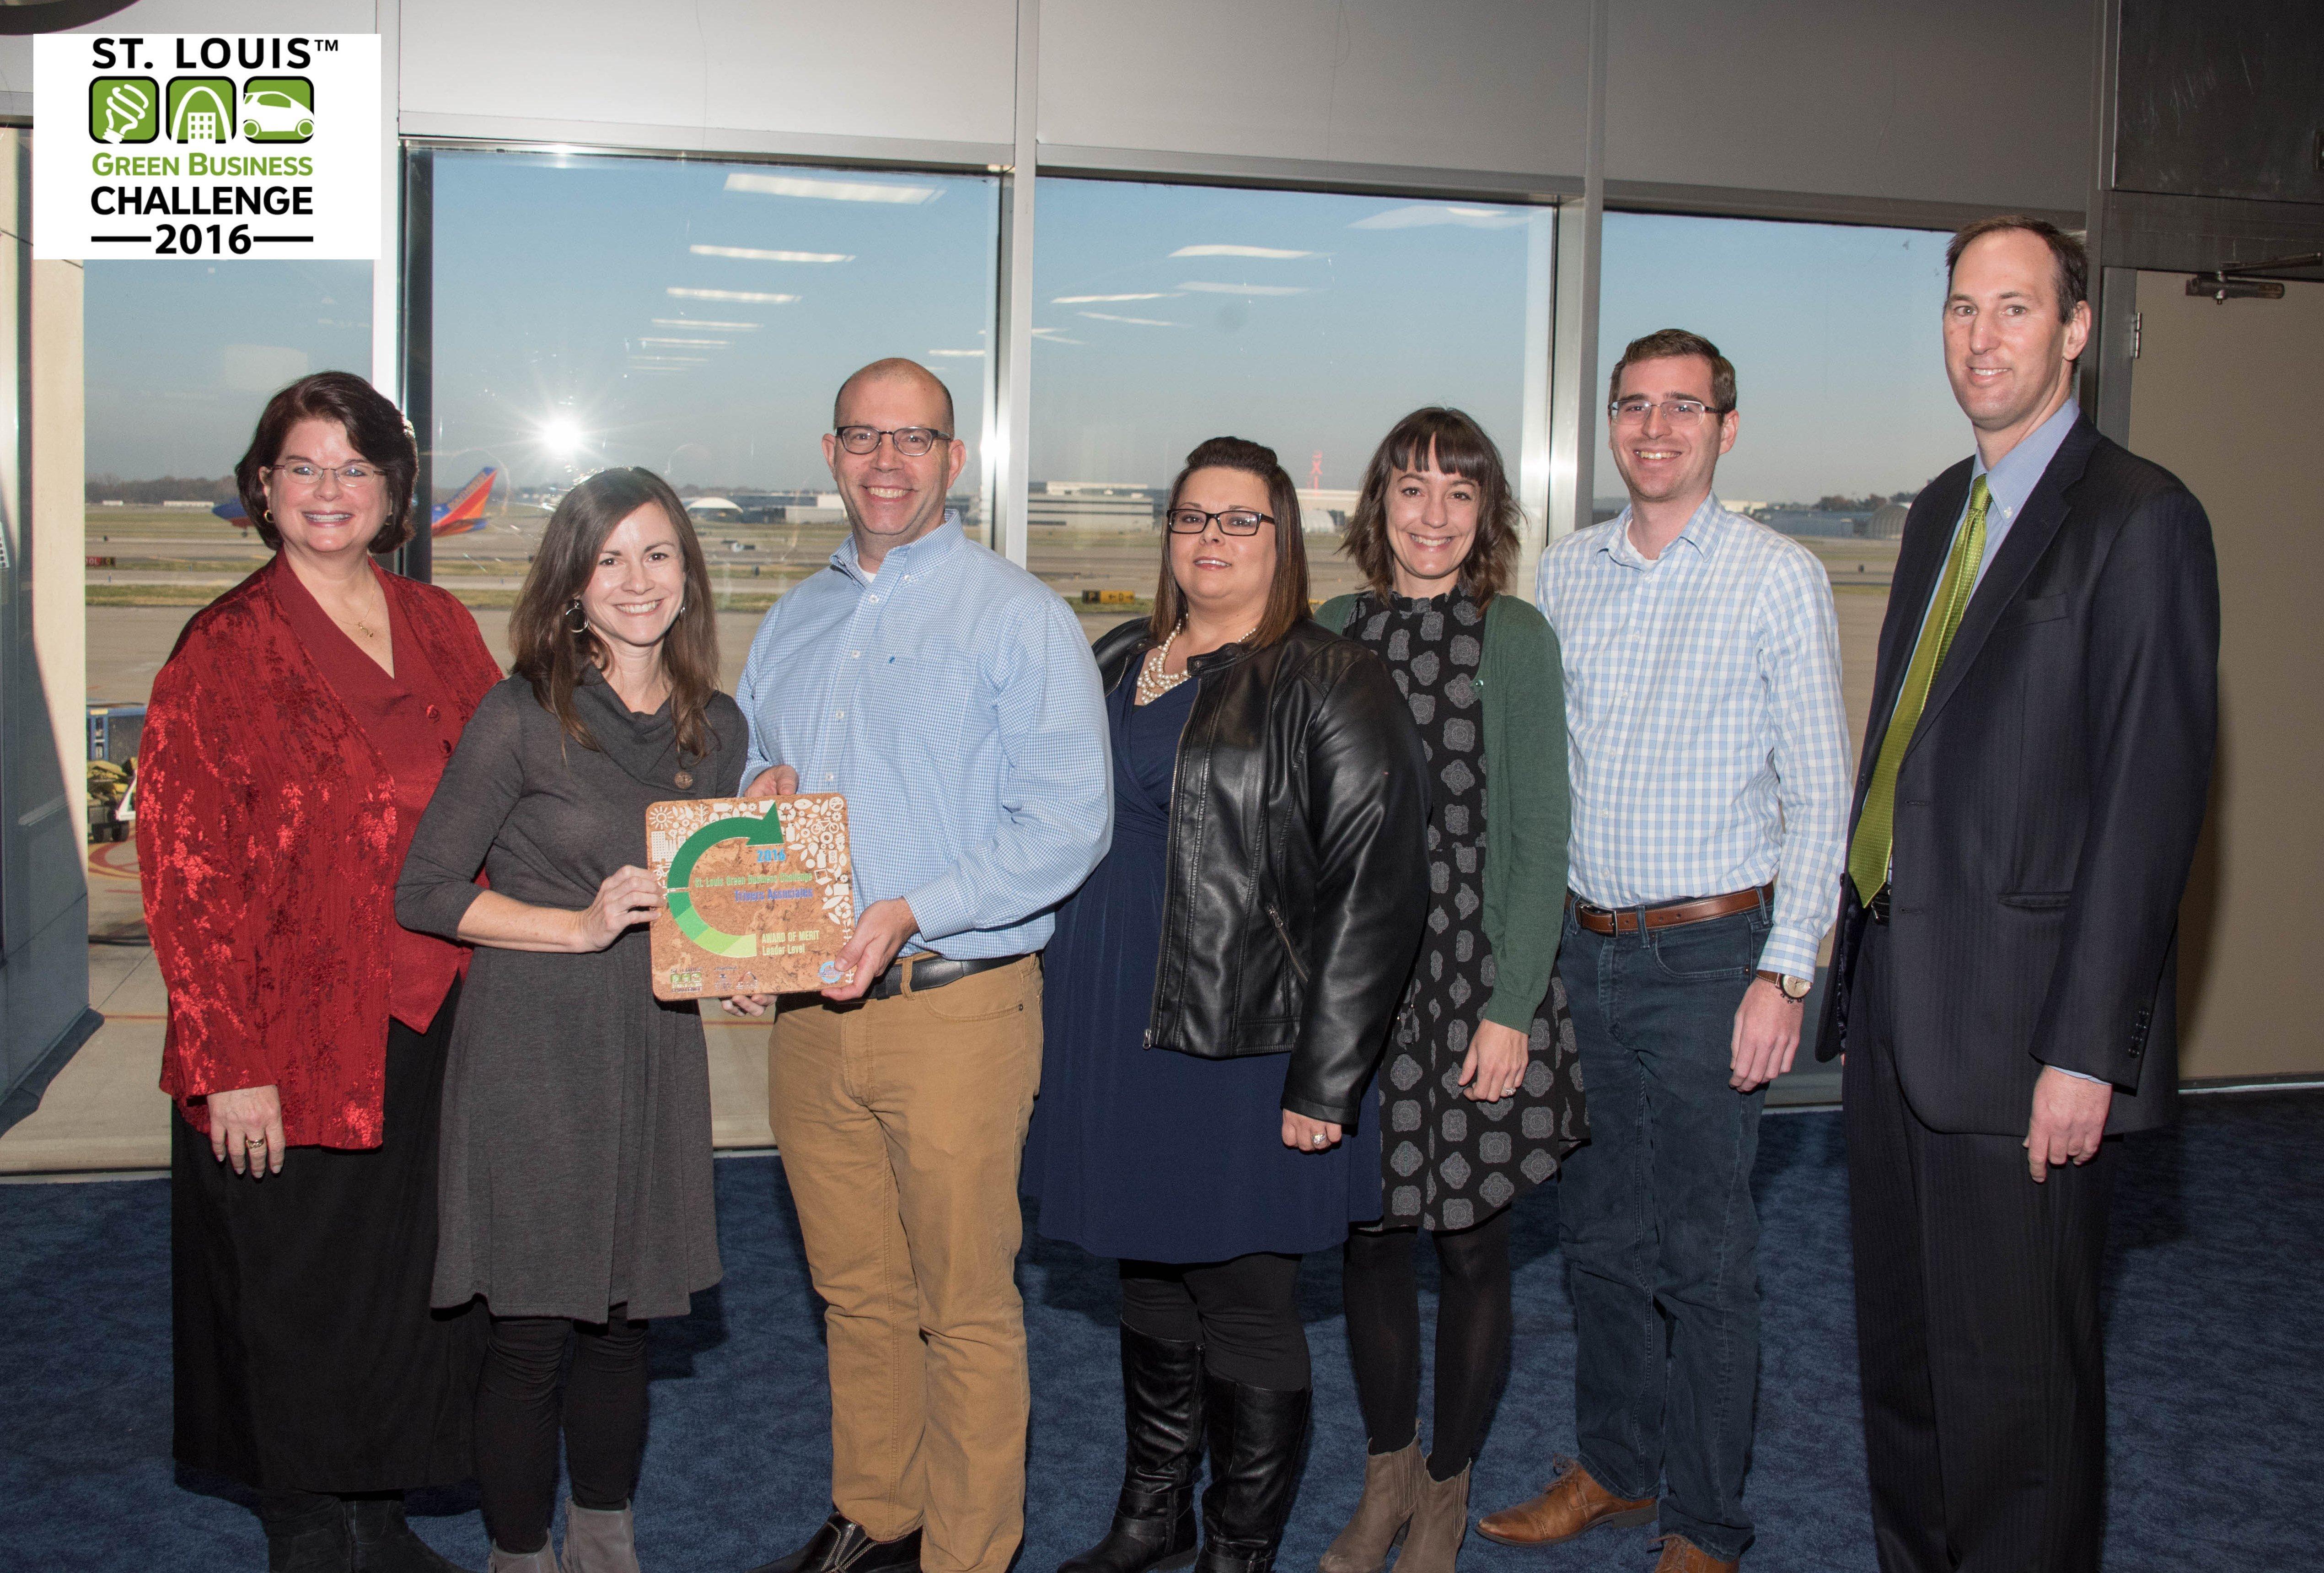 Trivers Associates receives an award